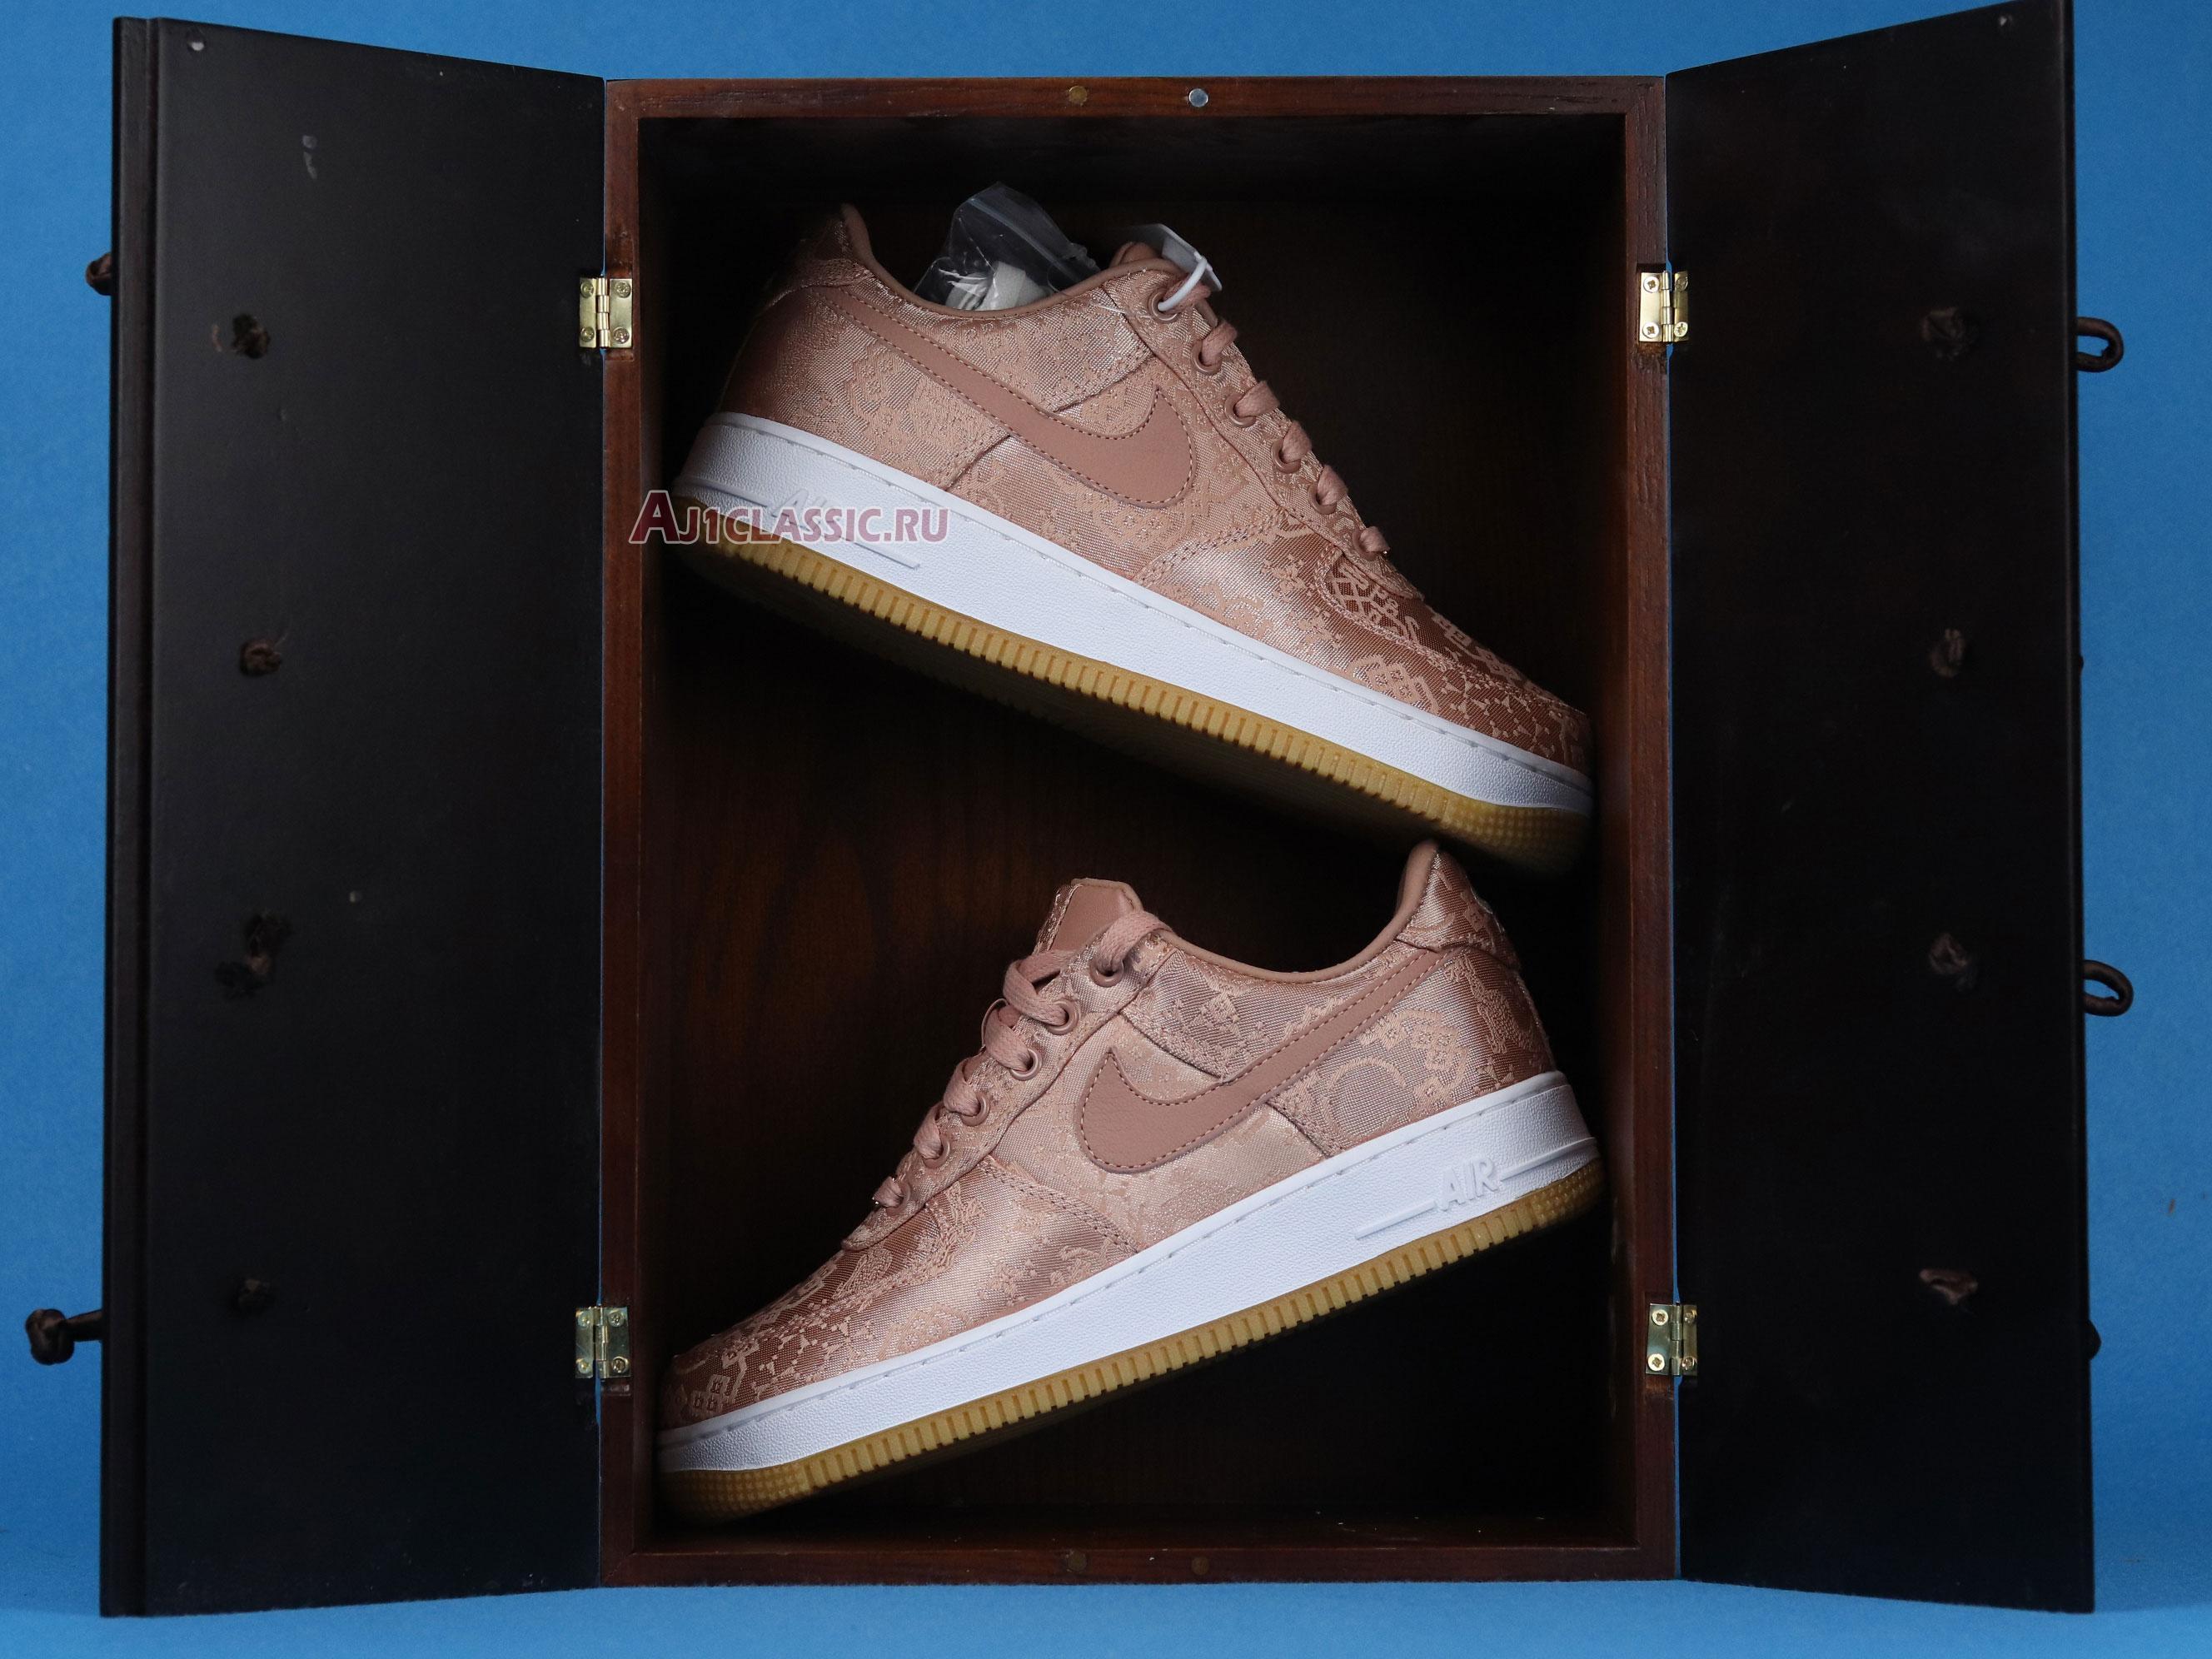 "CLOT x Air Force 1 Low Premium ""Rose Gold Silk"" Special Box CJ5290-600"